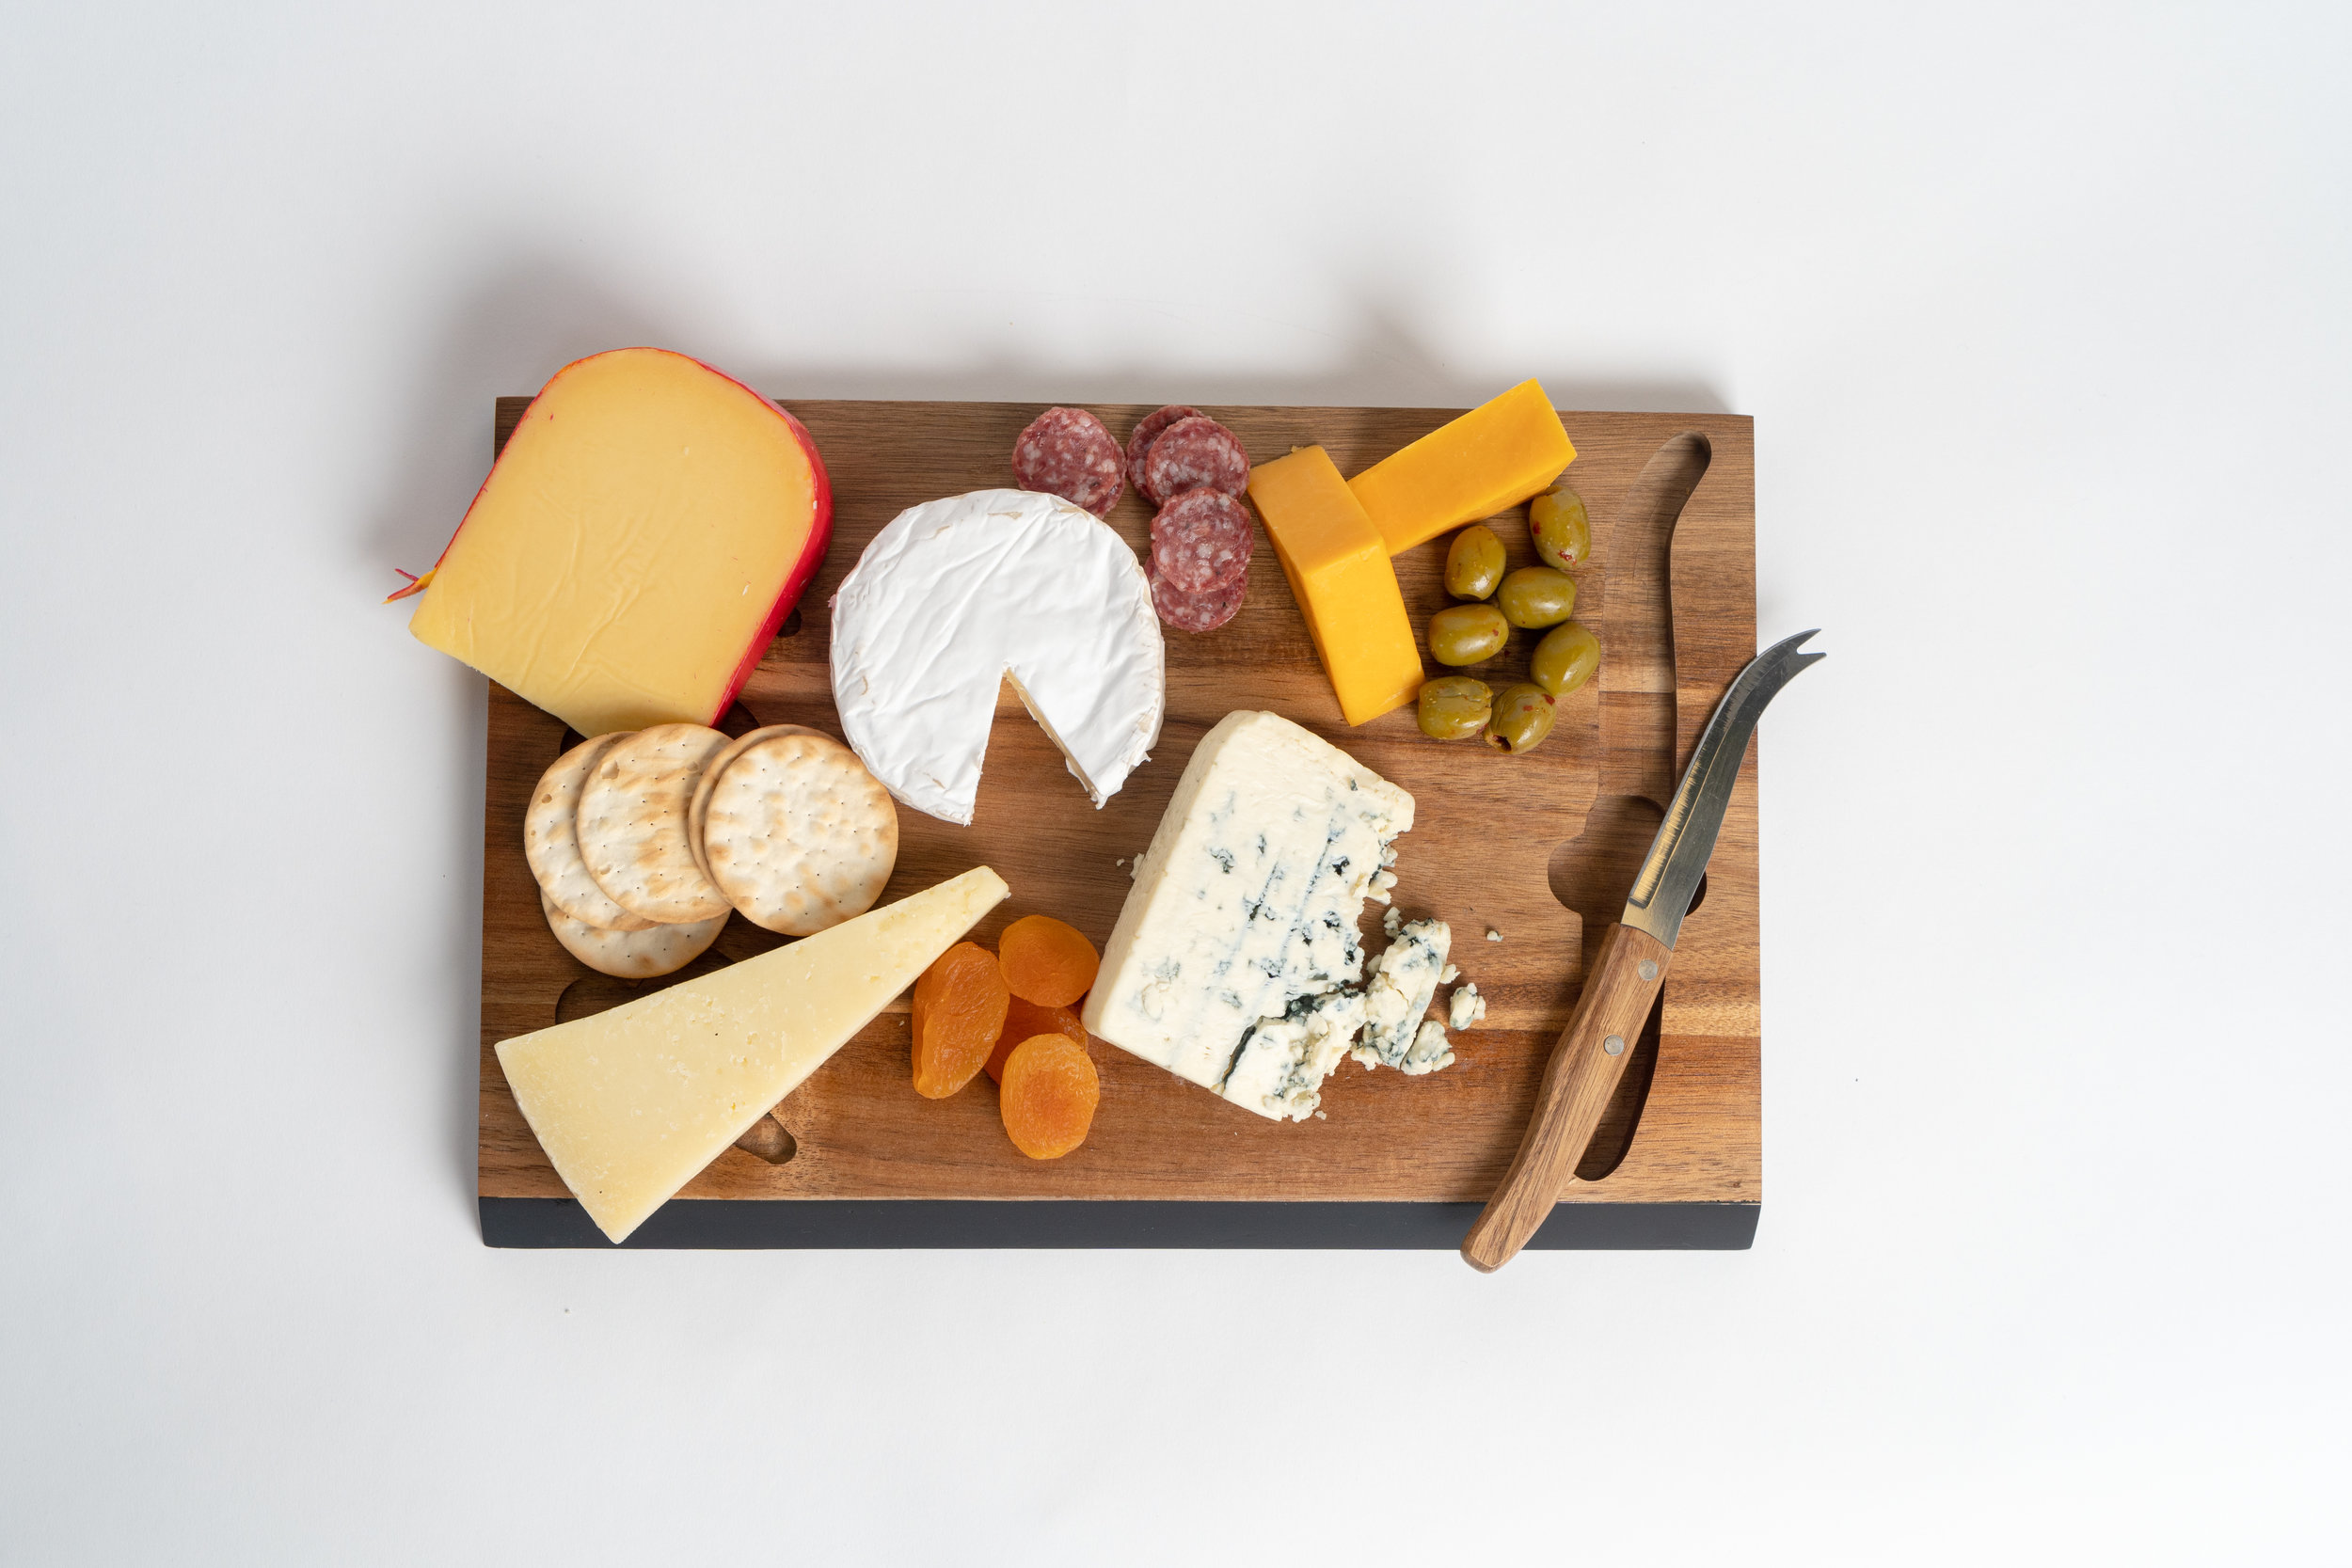 Cheese-&-Wine-quick-edits (5 of 5).JPEG